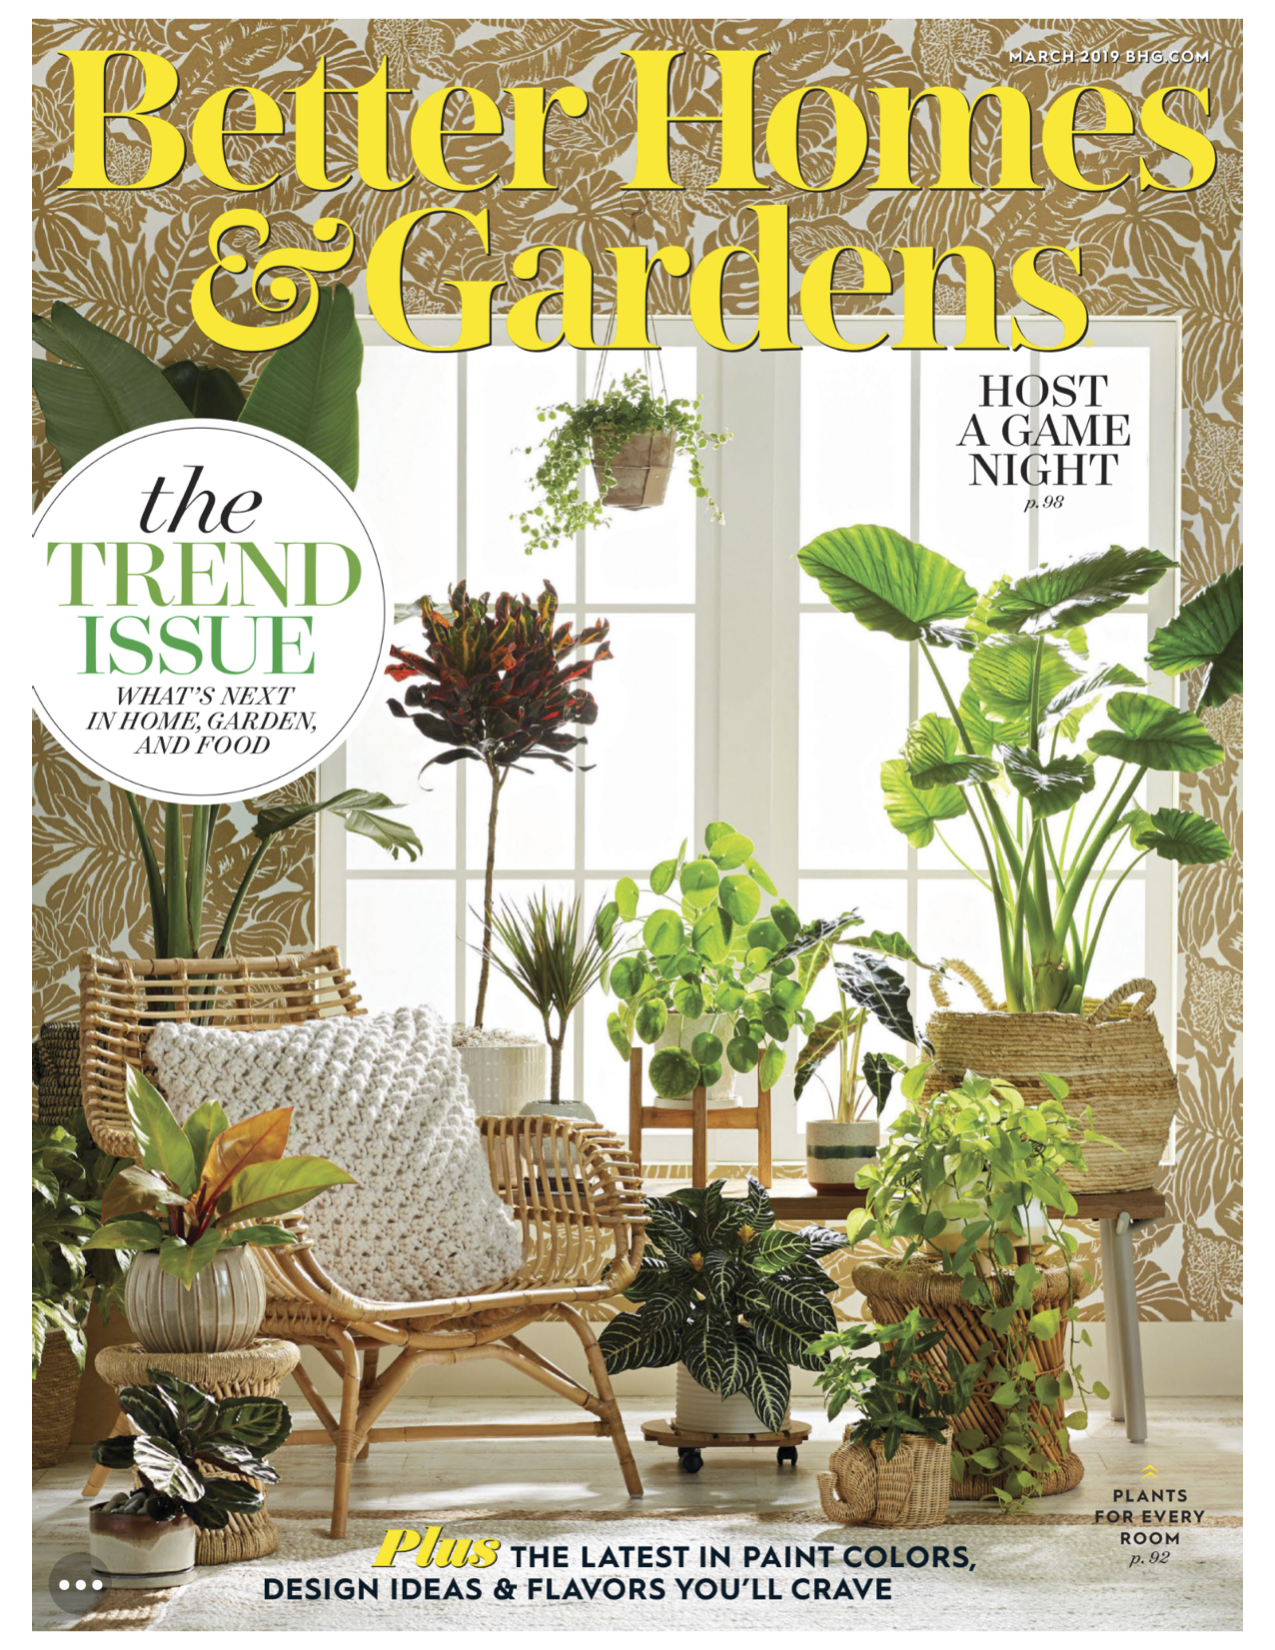 Better Homes & Gardens_March 2019.jpg